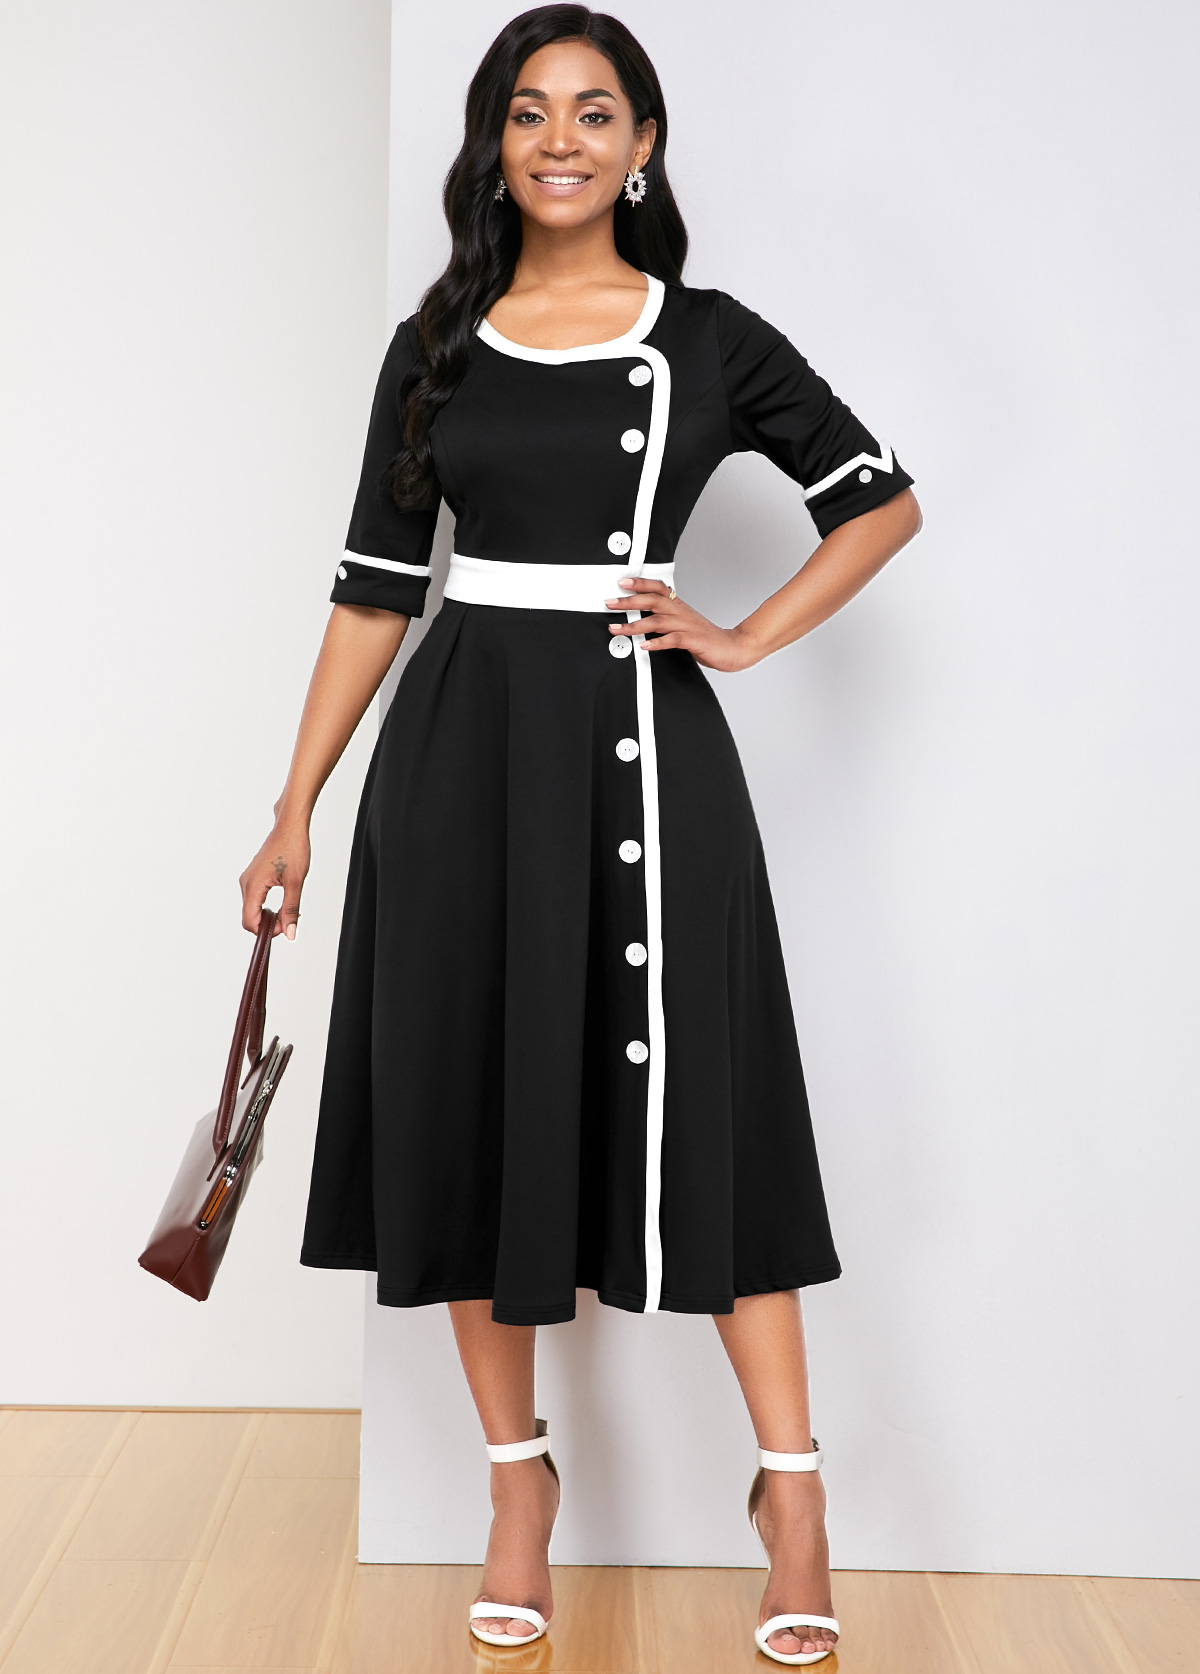 ROTITA Contrast Panel Half Sleeve Round Neck Dress